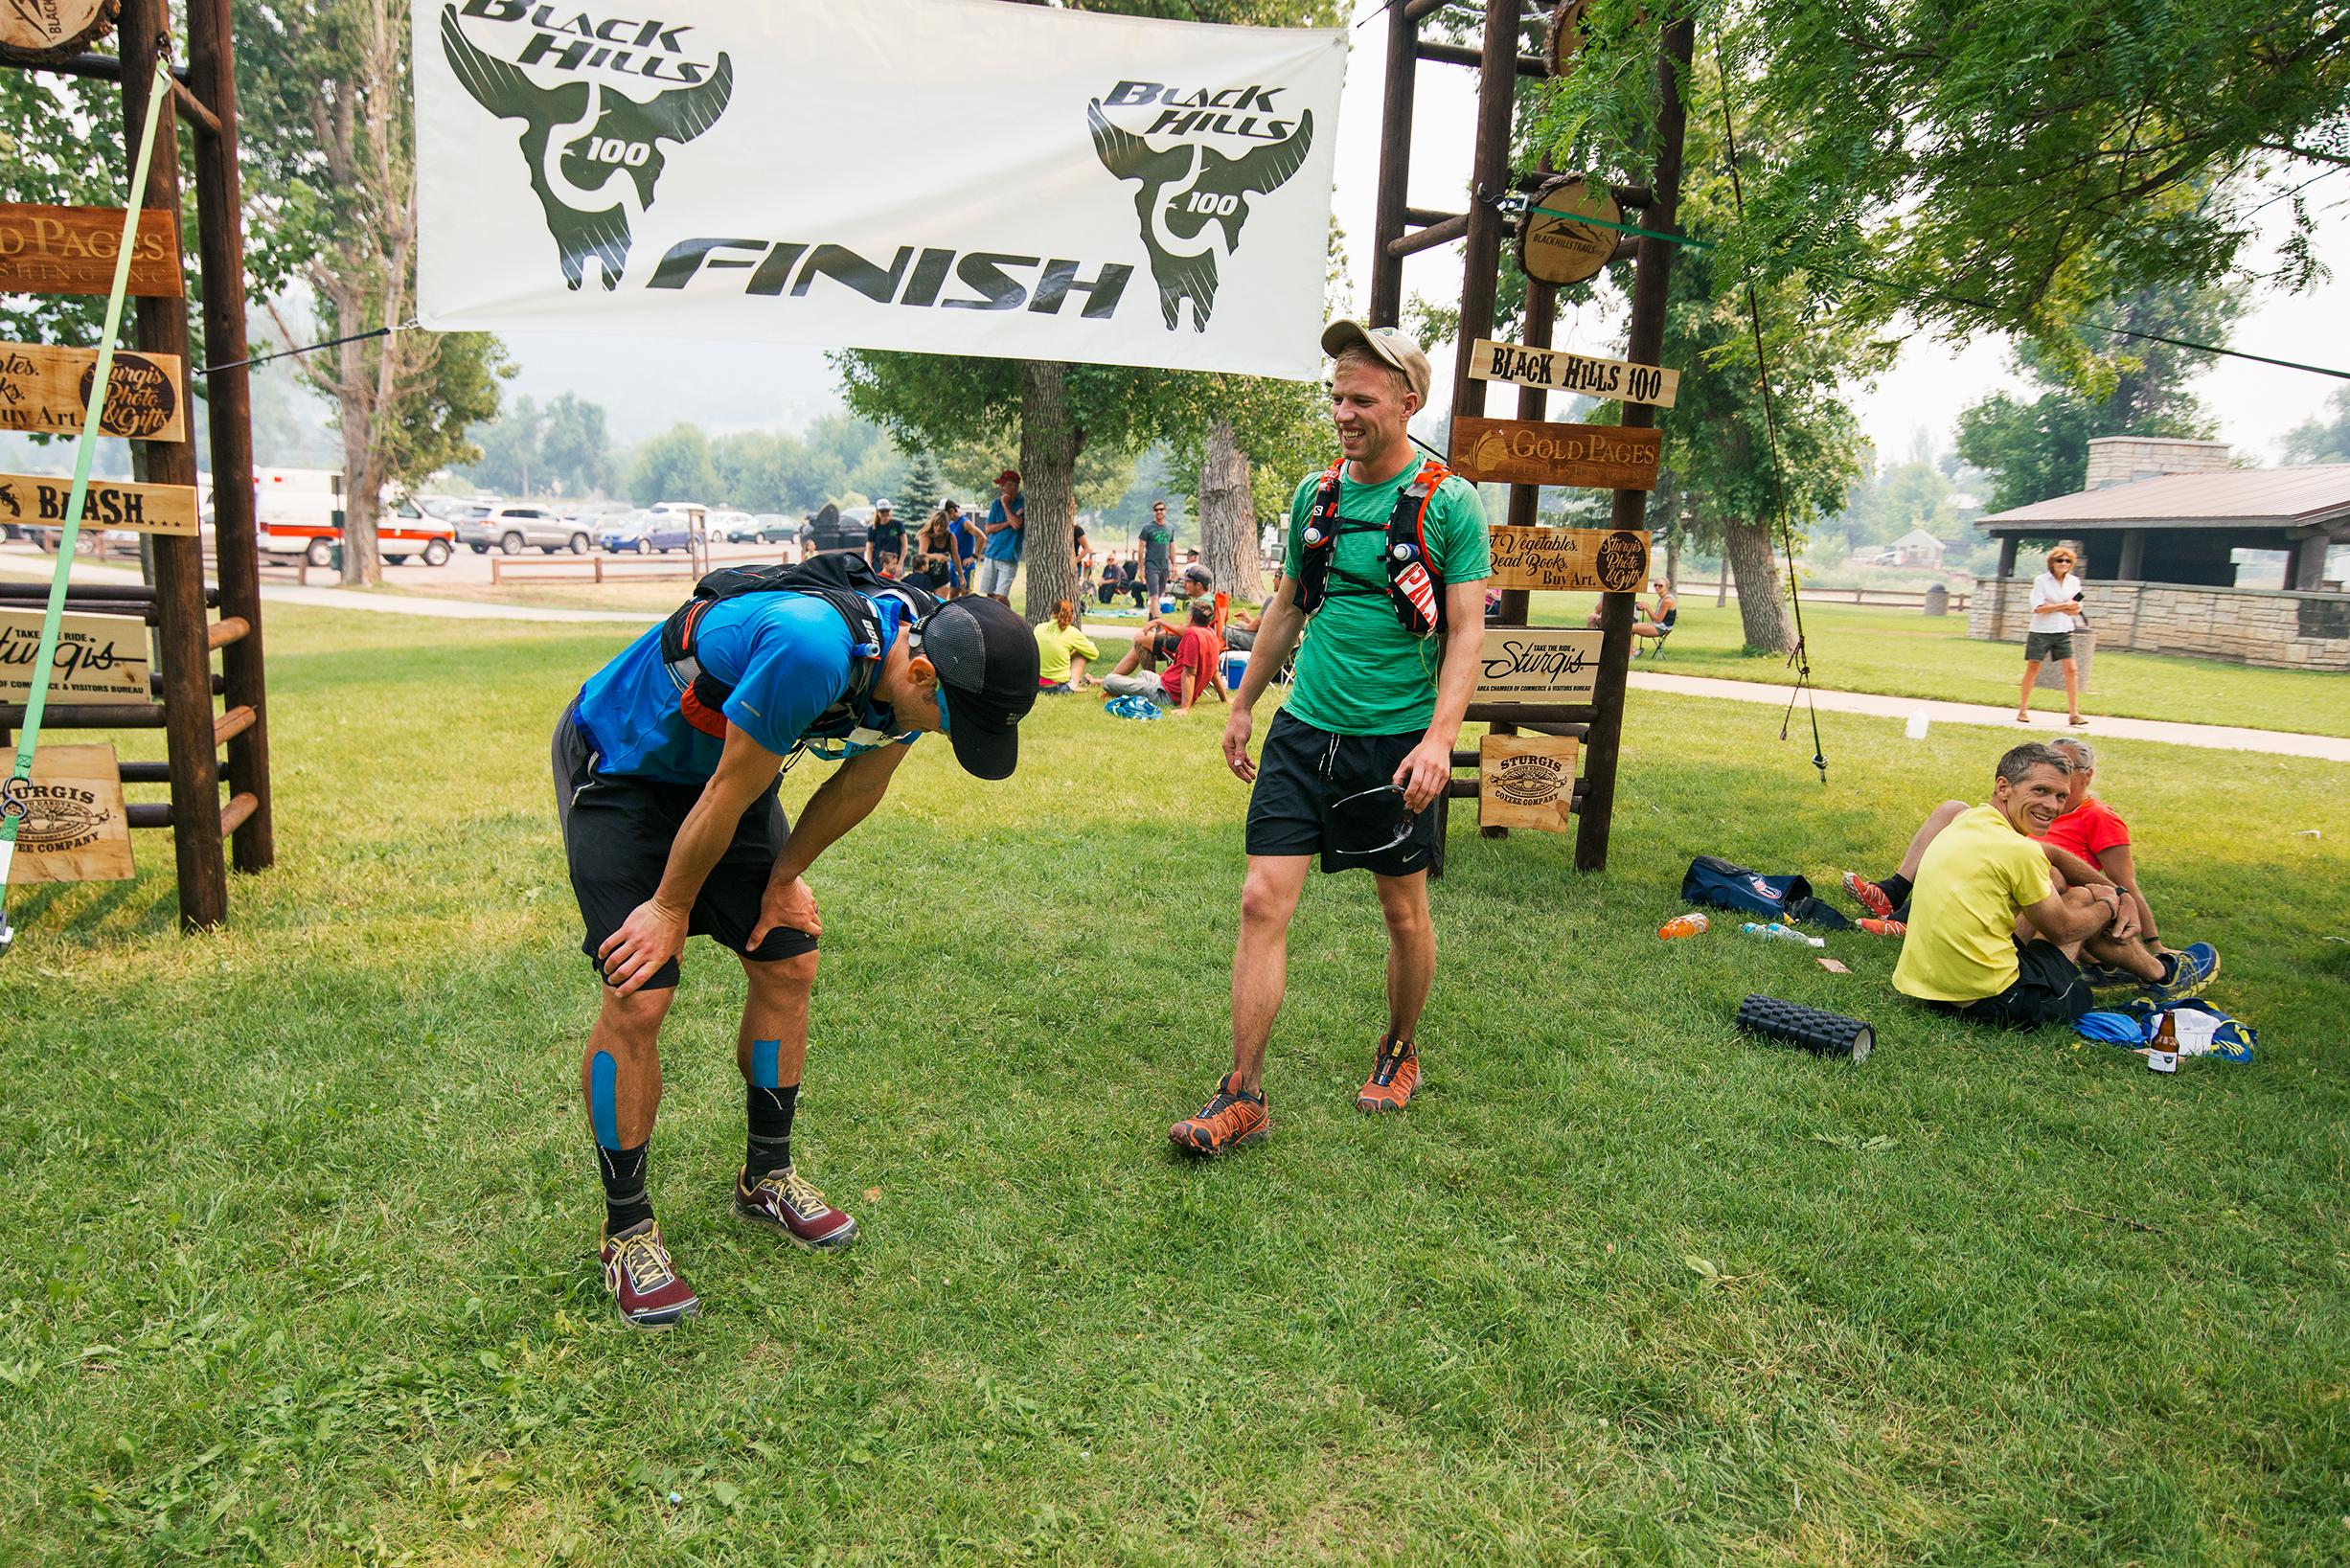 Black Hills 100 Finish